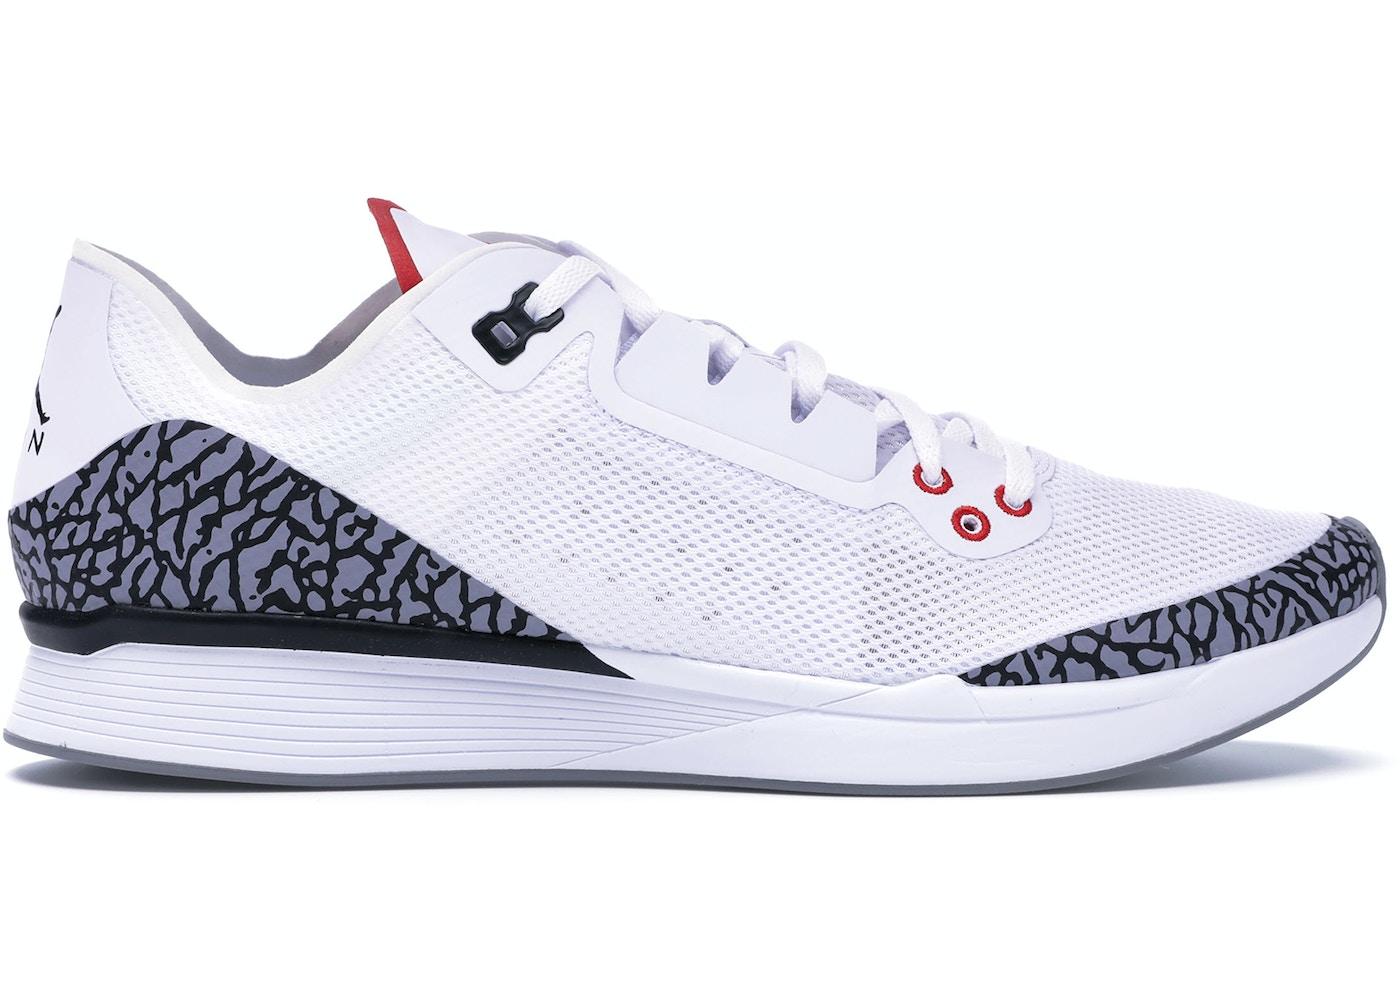 ecd88489ab52 Buy Air Jordan Other Shoes   Deadstock Sneakers